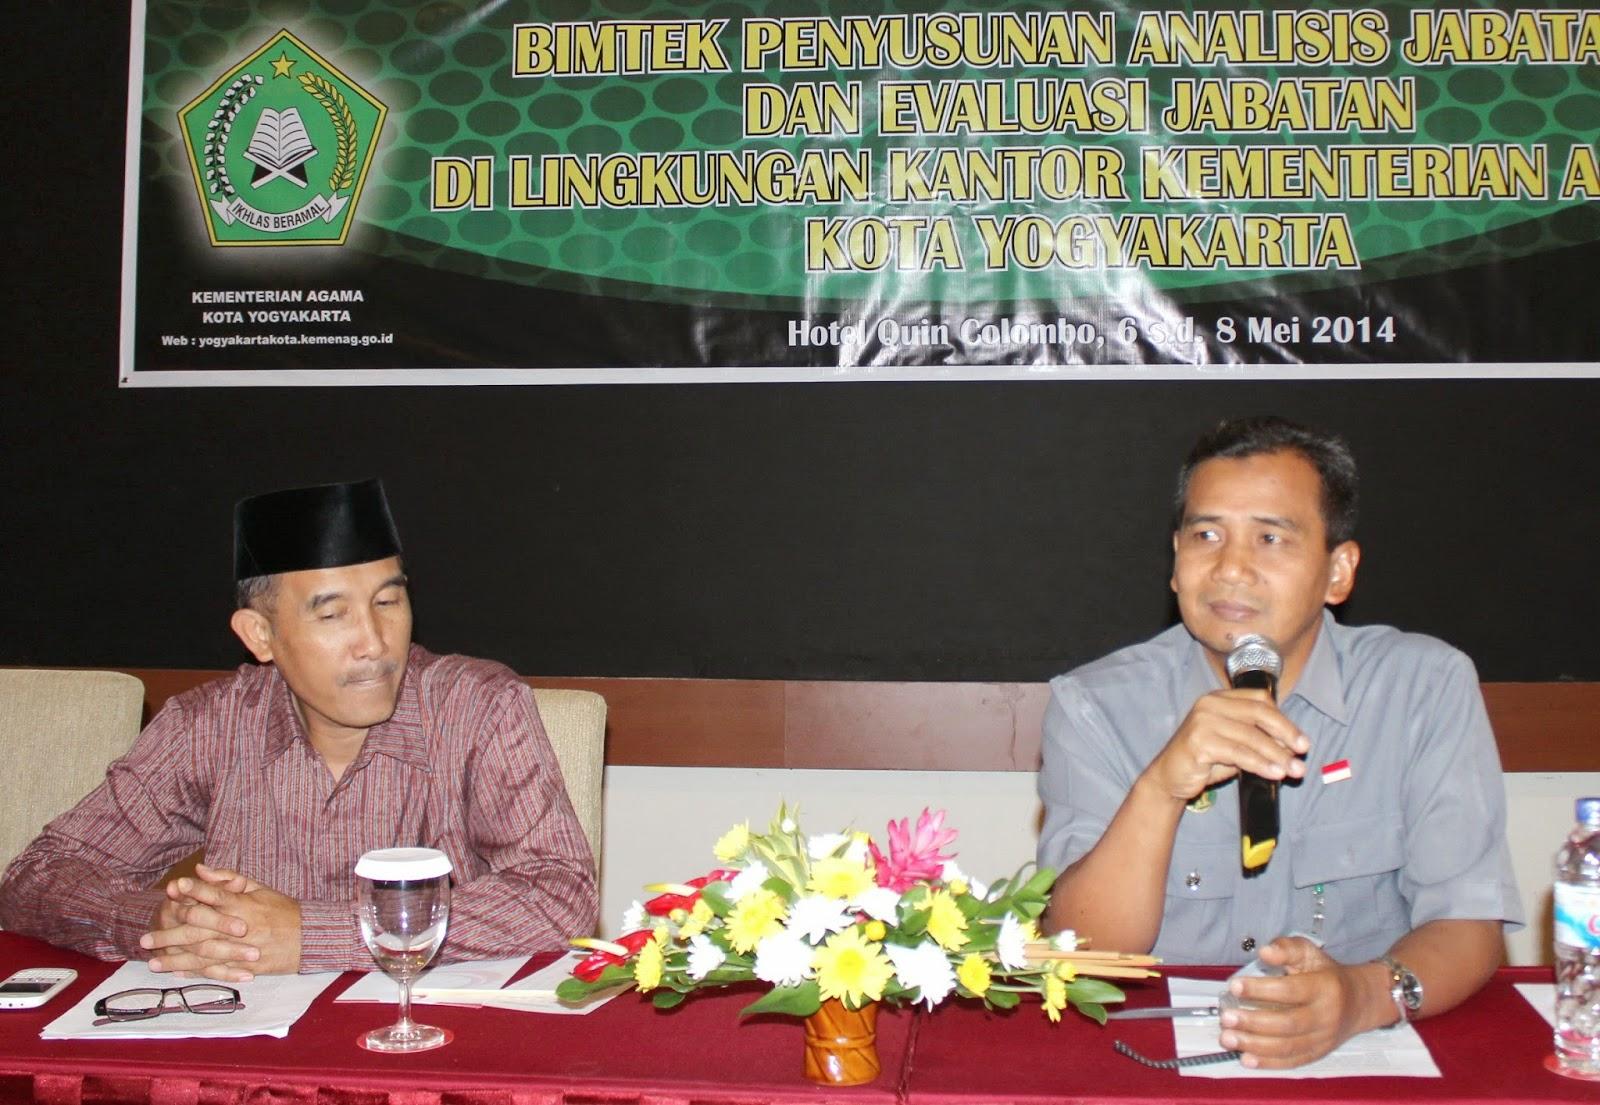 Menteri Agama Wikipedia: Penyuluh Agama Islam Jogja: Bimtek Penyusunan Analisis